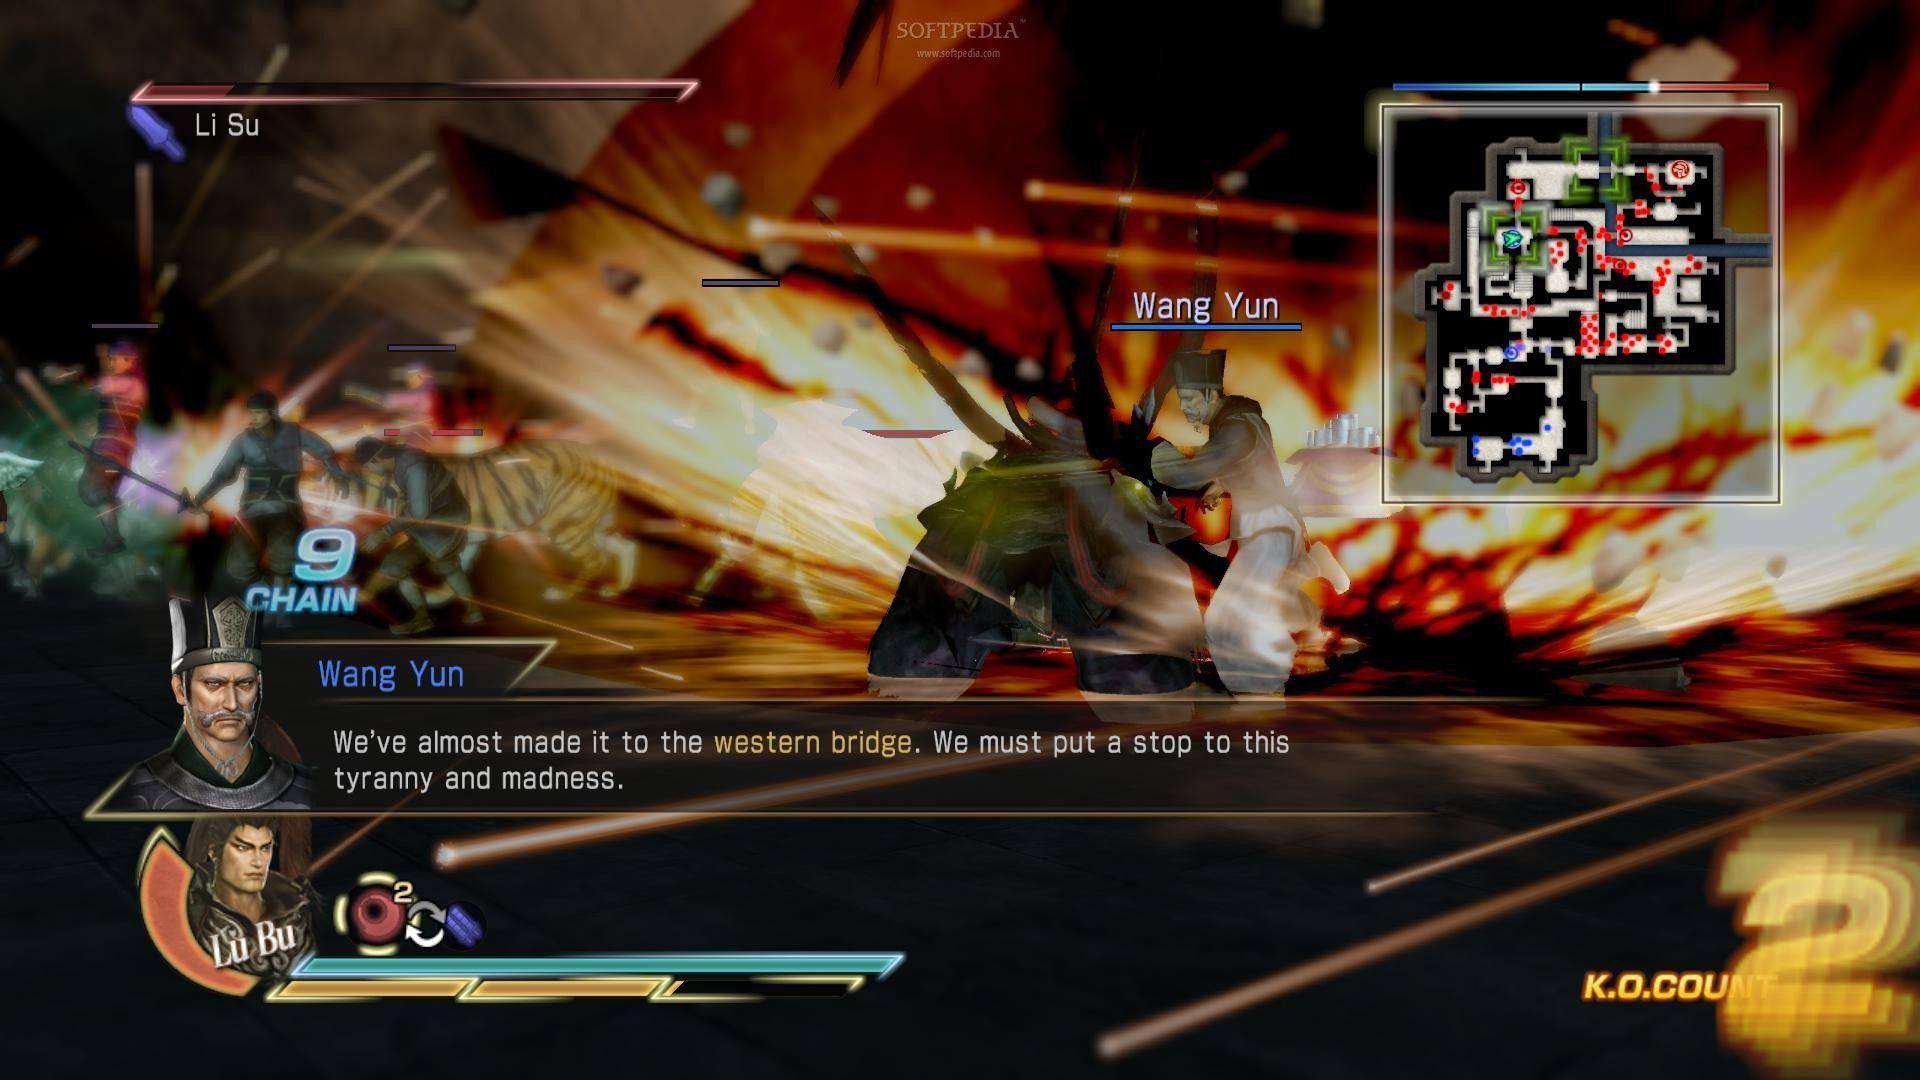 Co-Optimus - Dynasty Warriors 8: Xtreme Legends (PC) Co-Op ...